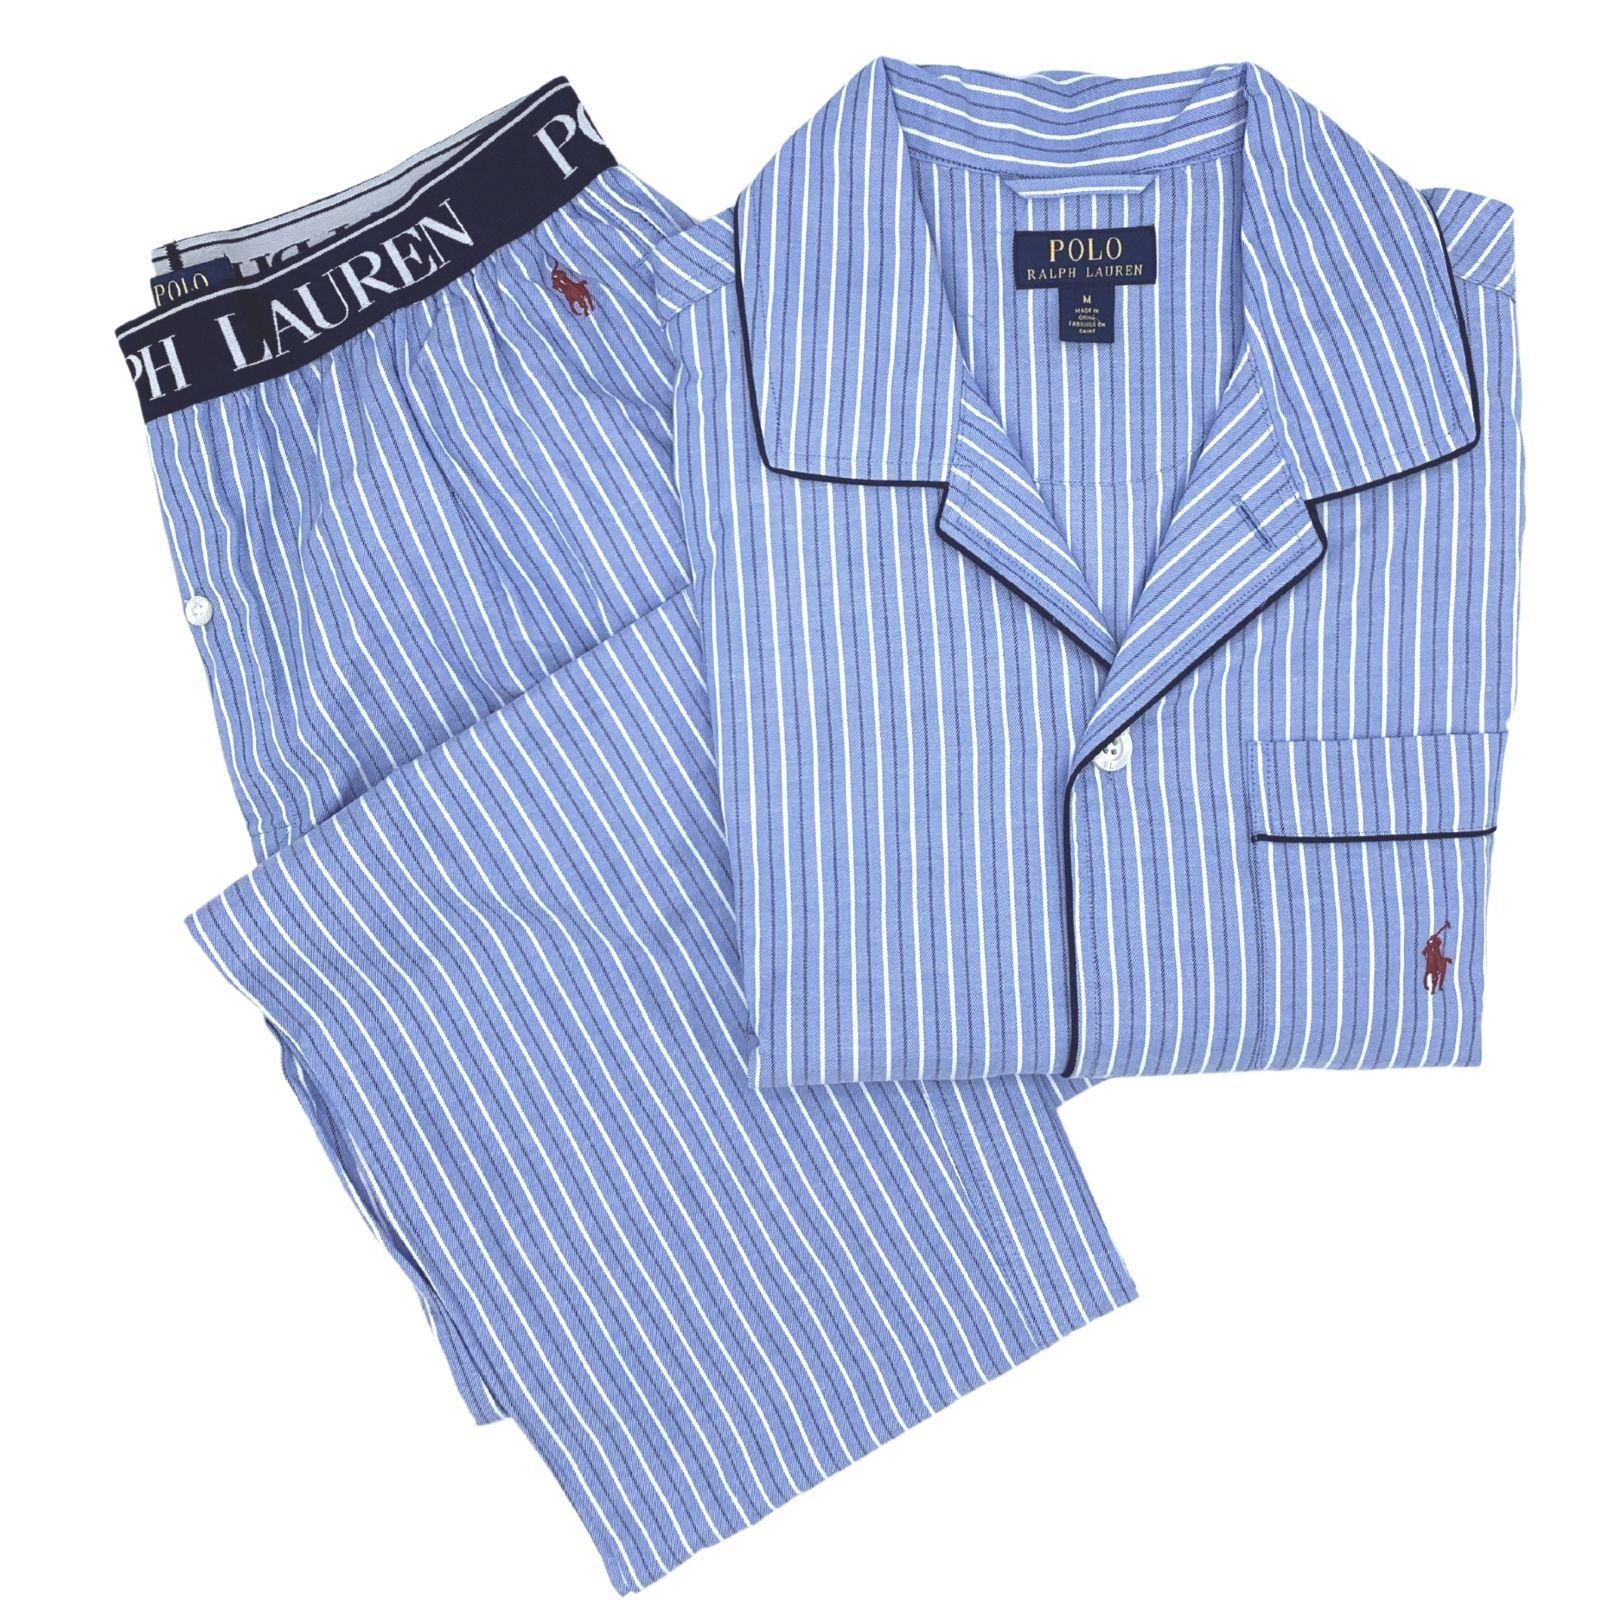 "POLO RALPH LAUREN - Herren-Pyjama ""Madison Stripe"""